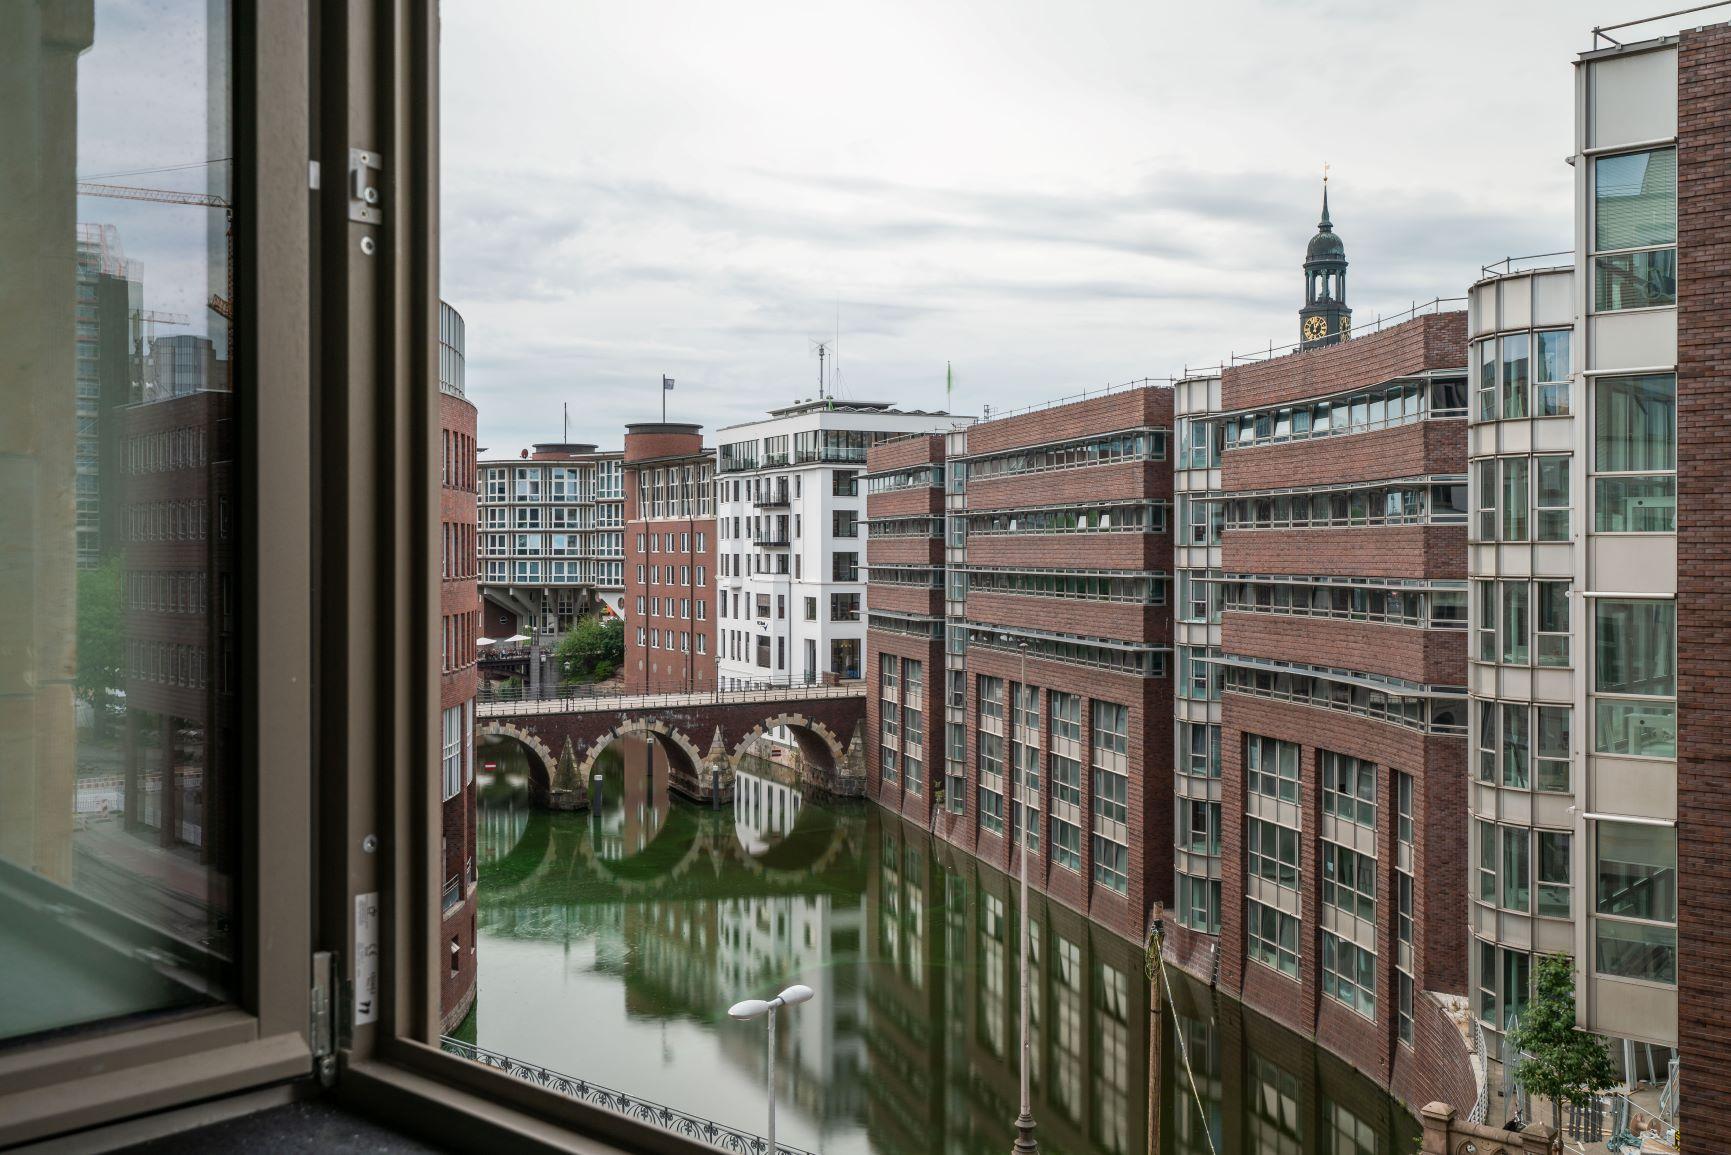 CSB-Stadthoefe-05848.jpg